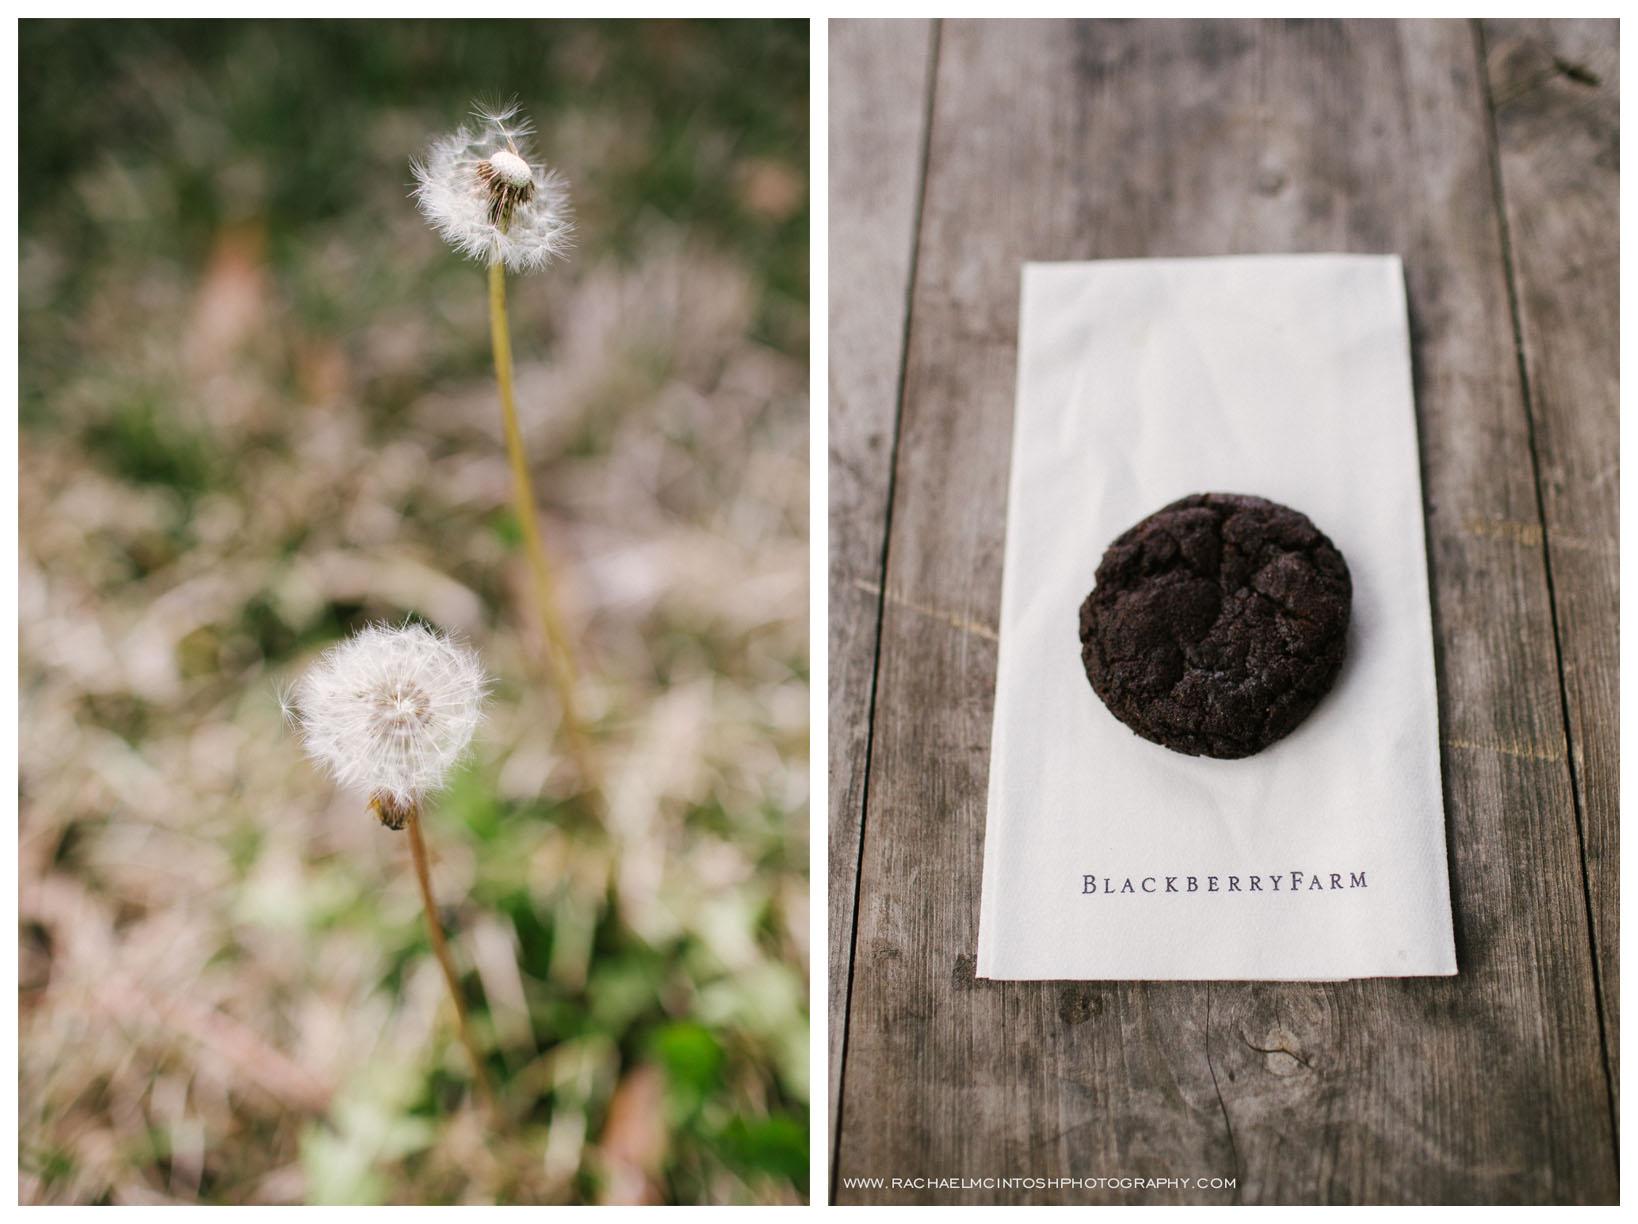 Blackberry Farm - Wedding Venue 77.jpg